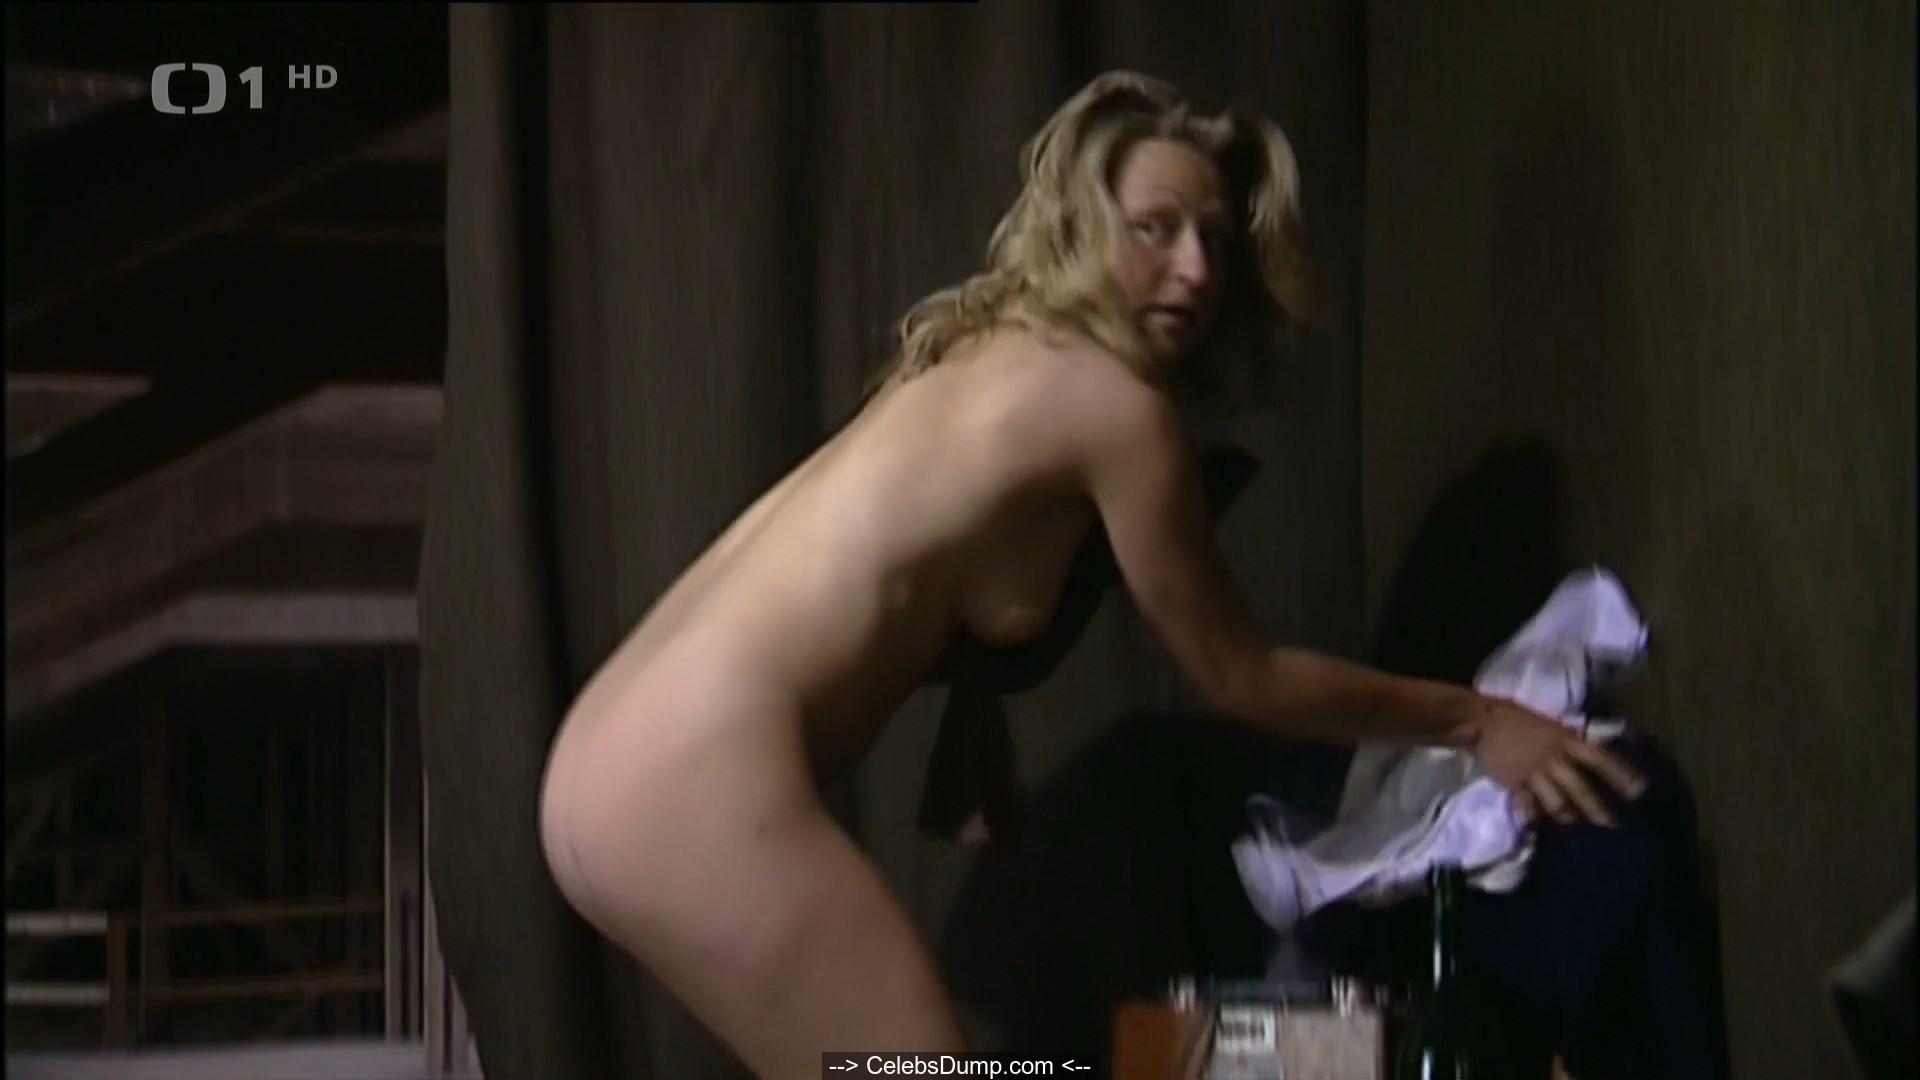 Nude cibulkova Klara Cibulkova